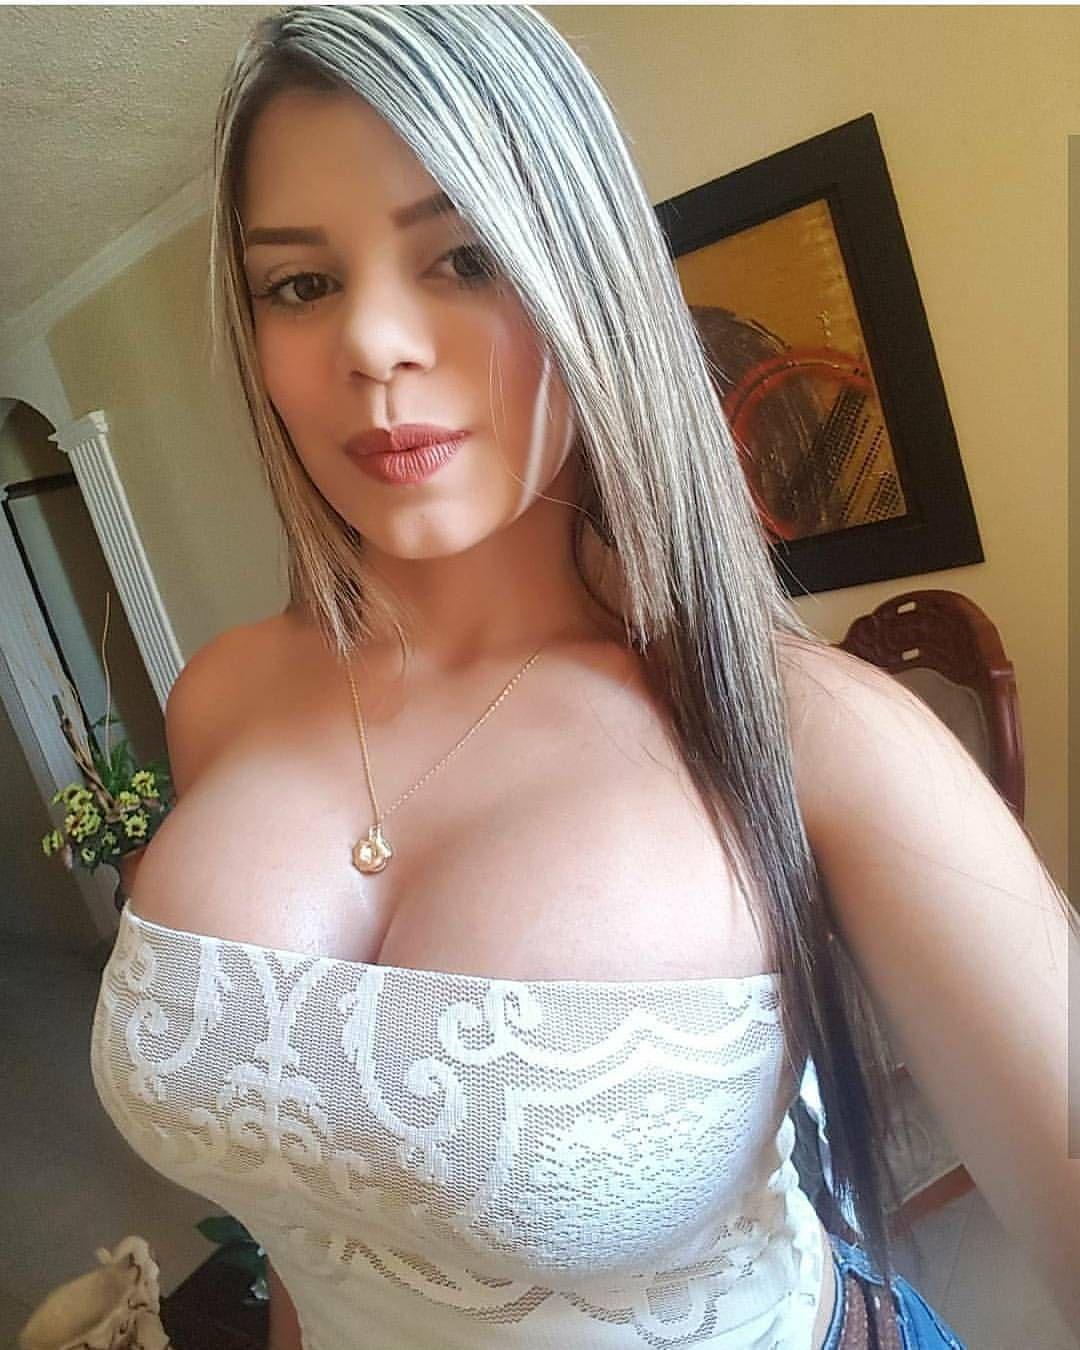 Trade nude pics online